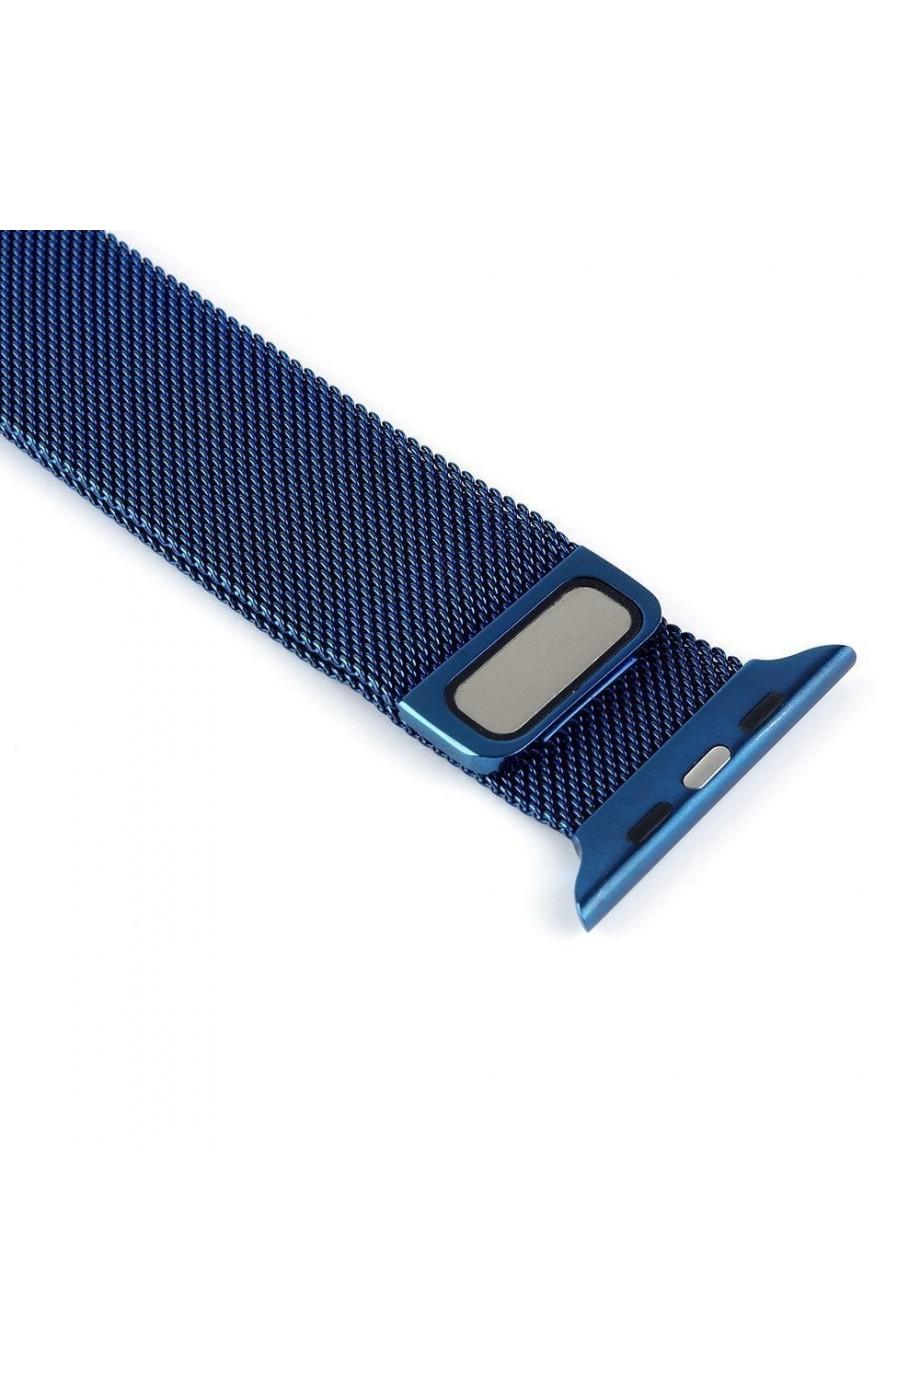 Металлический ремешок для Apple Watch 4/5 40 мм, синий